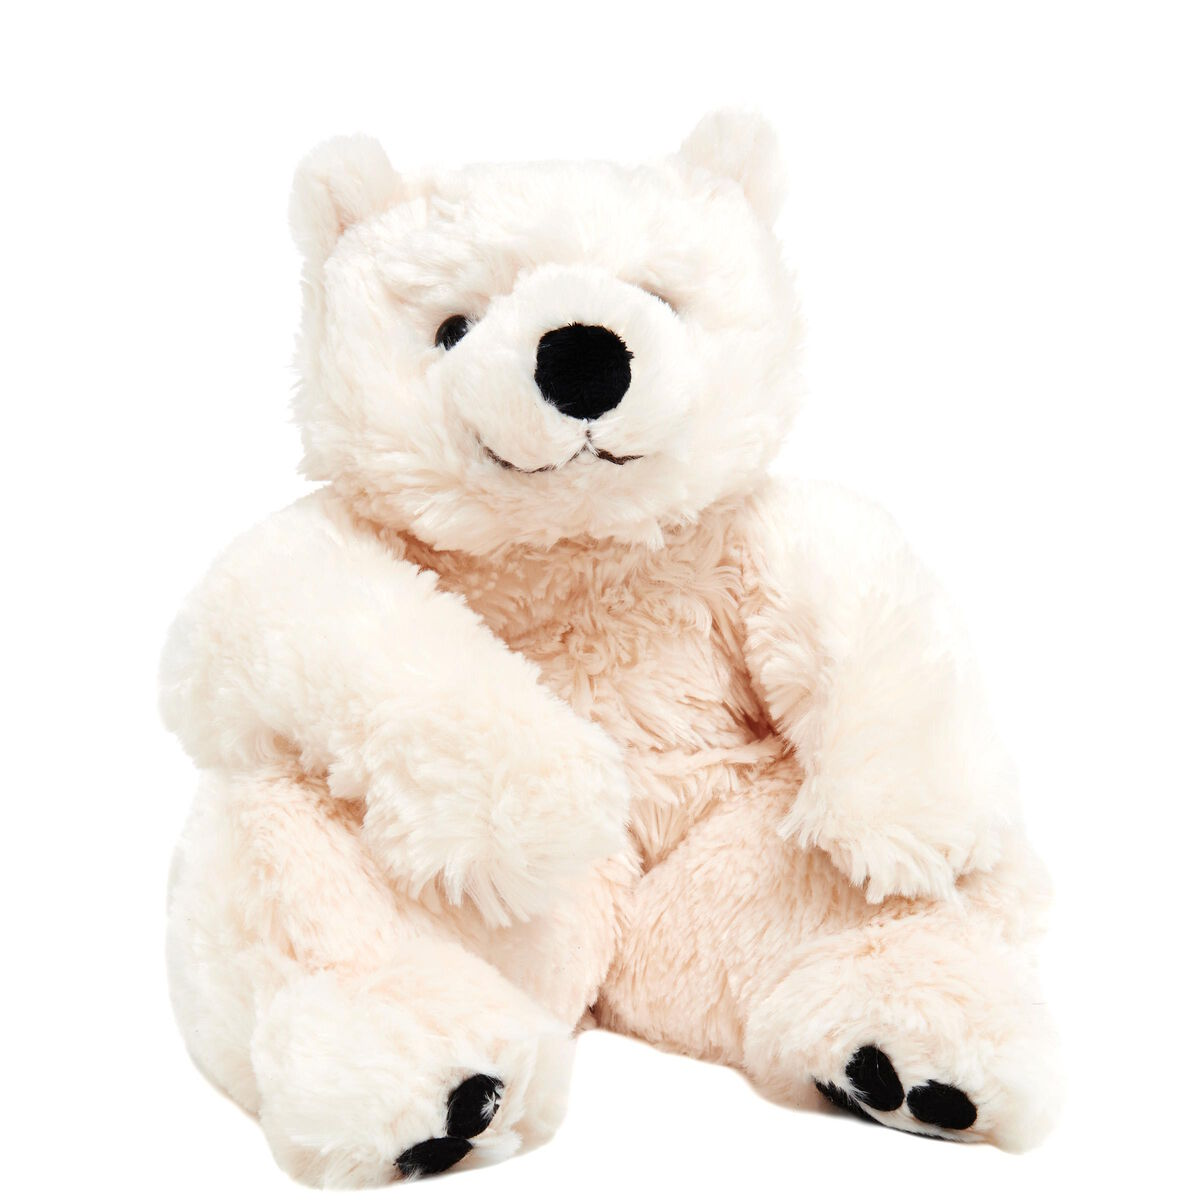 ANTONIO Plüsch Eisbär 40cm